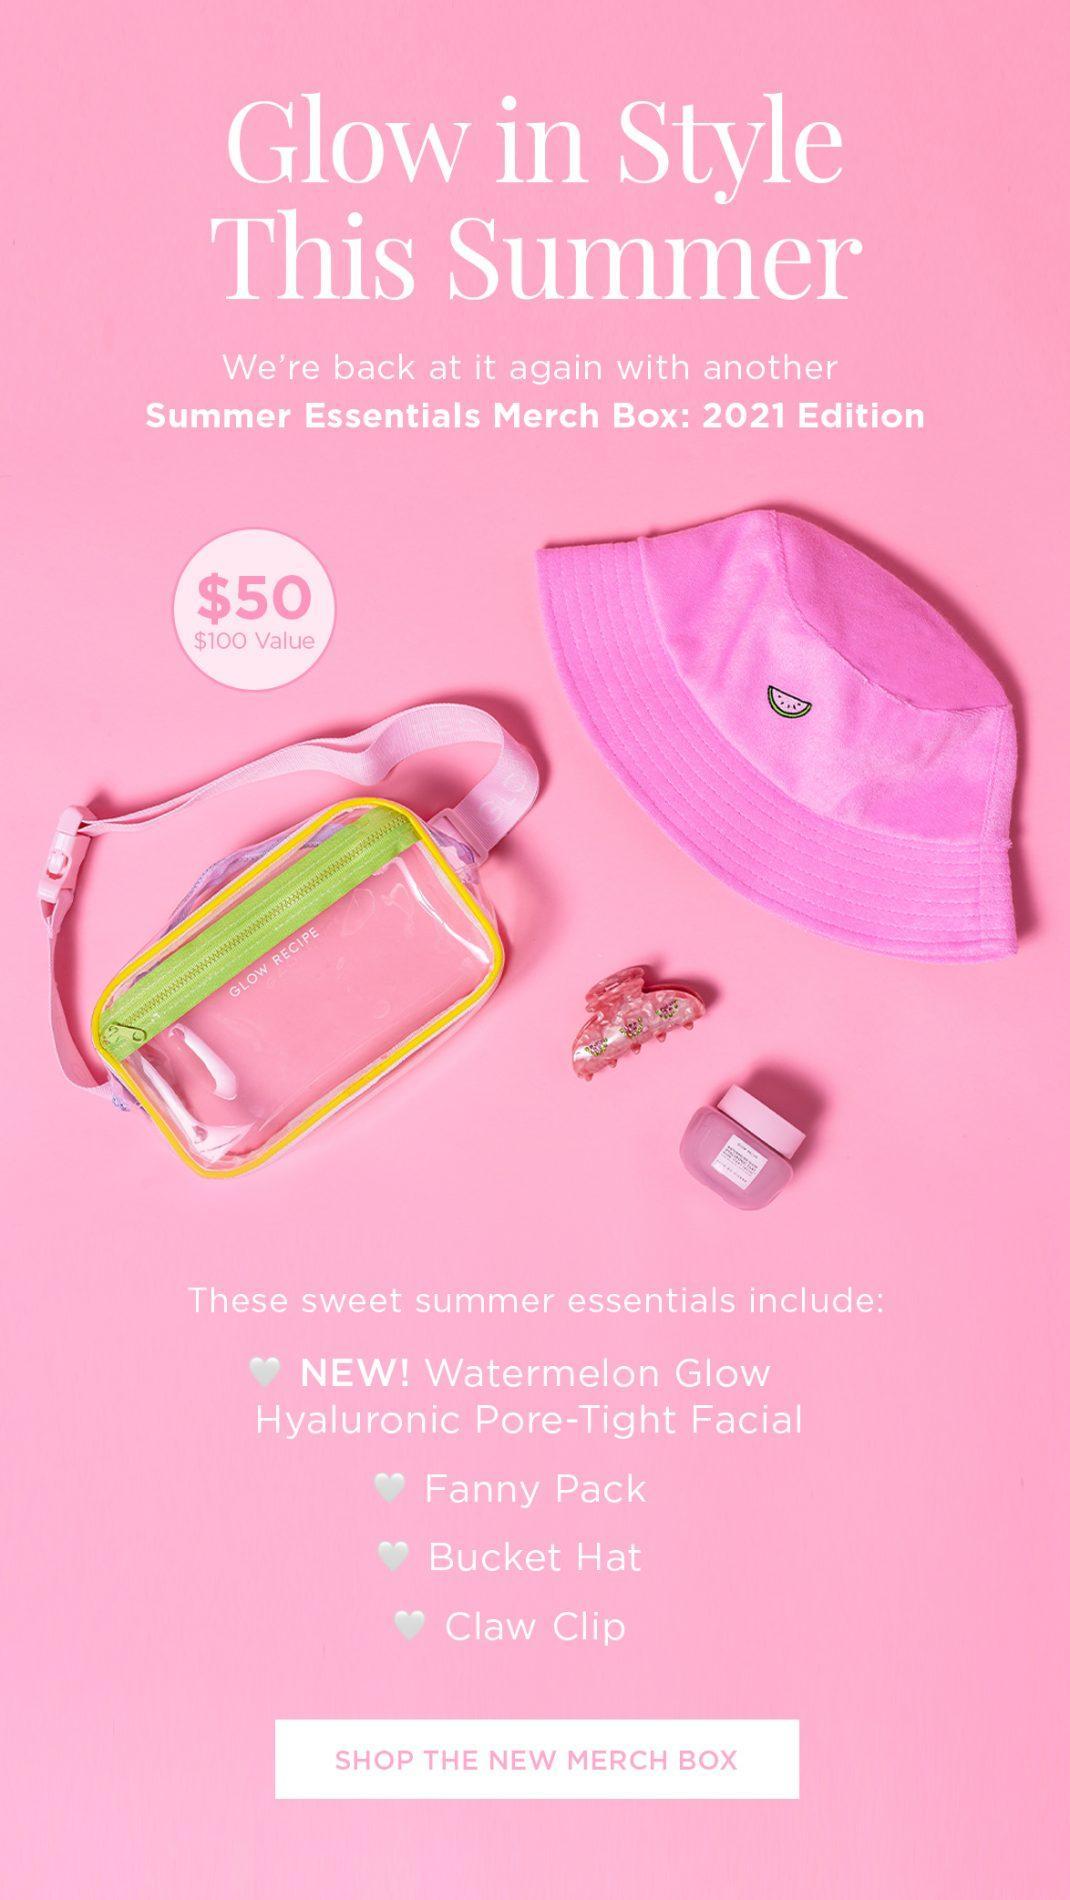 Glow Recipe Summer Essentials Merch Box: 2021 Edition